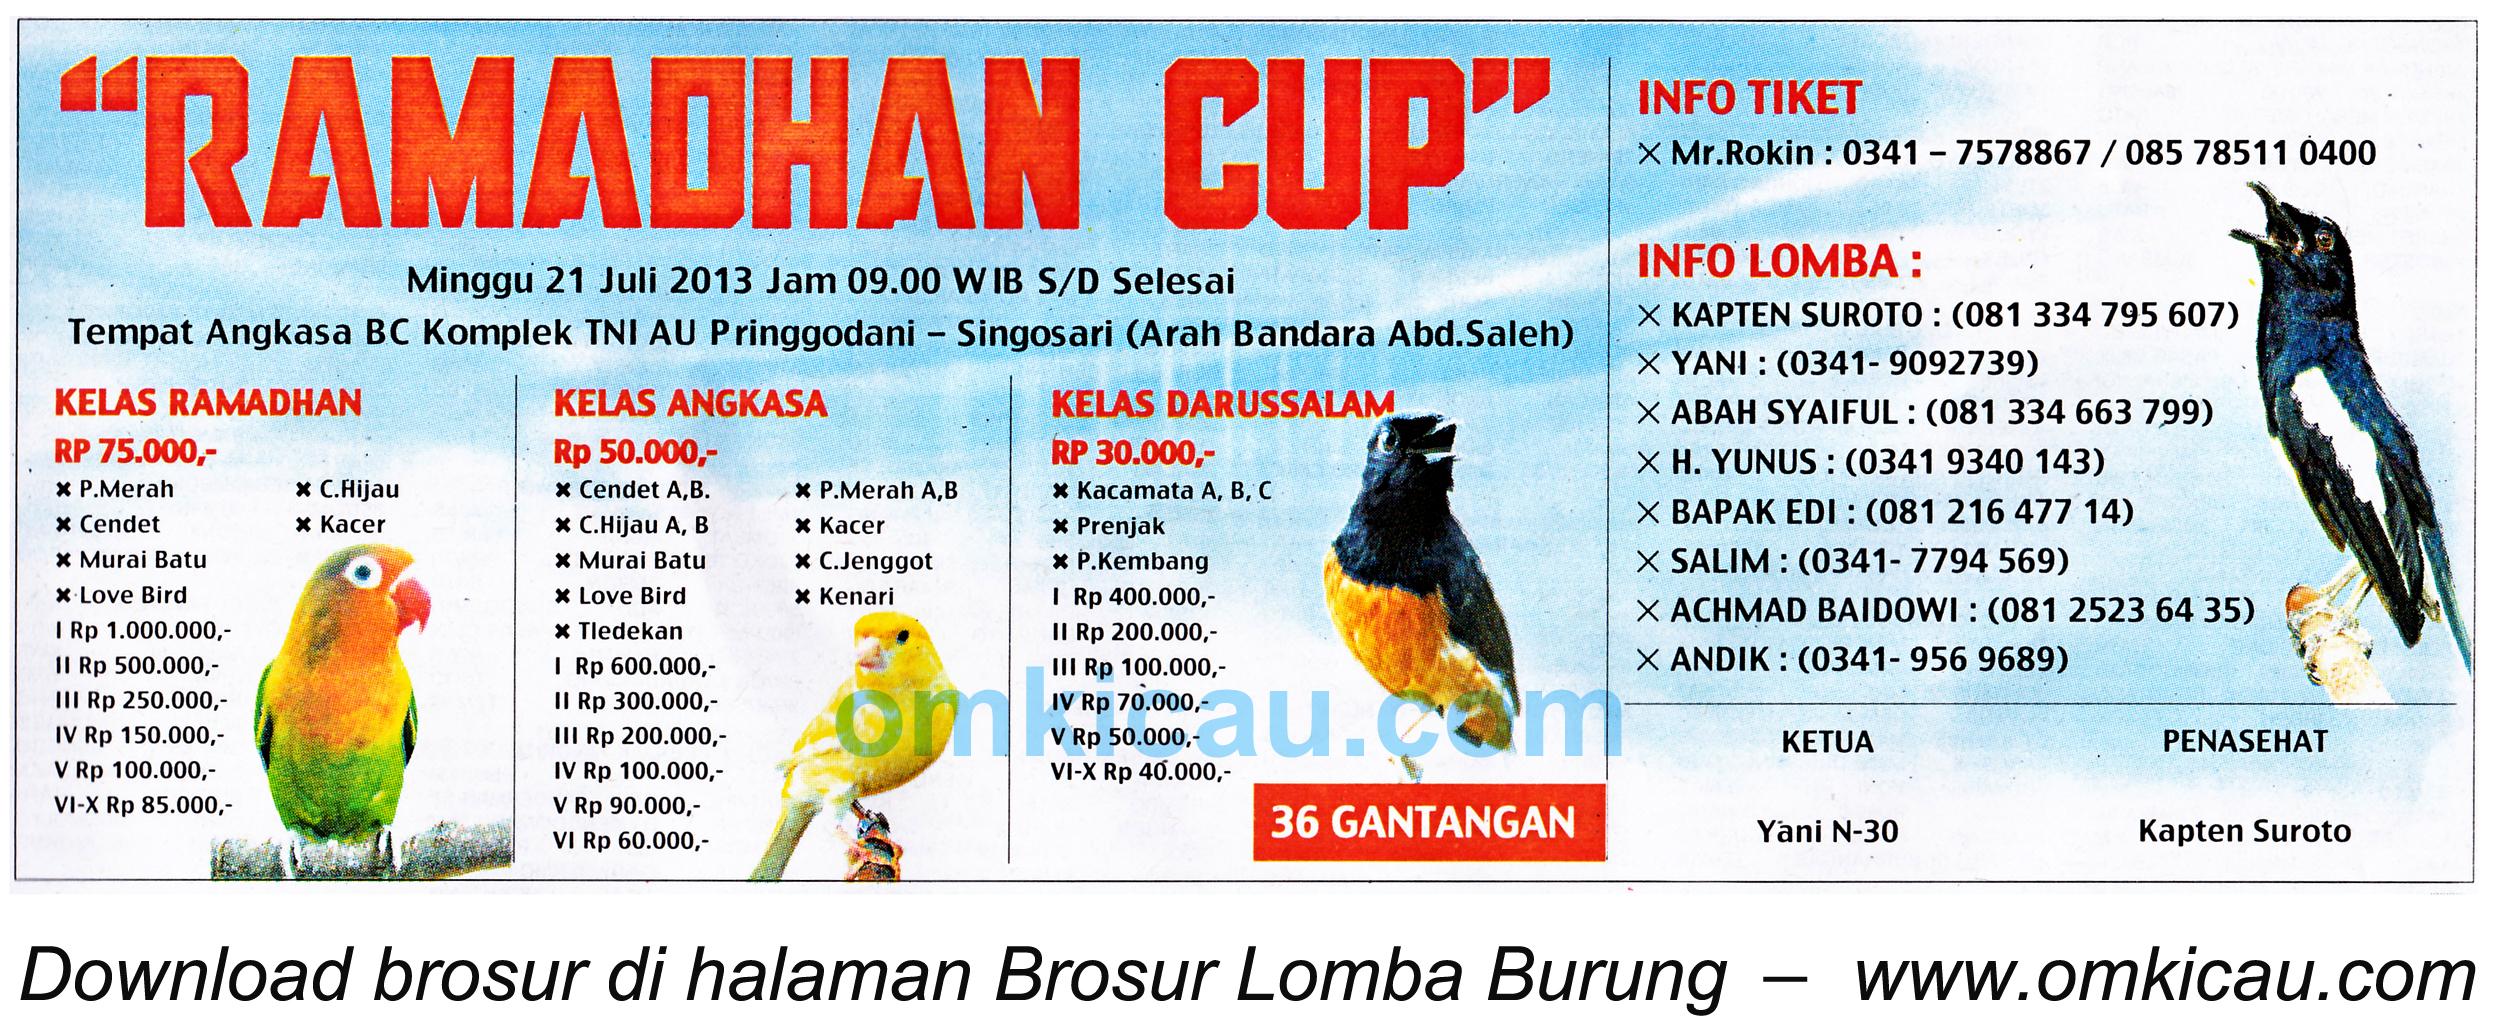 Brosur Lomba Burung Ramadhan Cup - Kab Malang - 21 Juli 2013